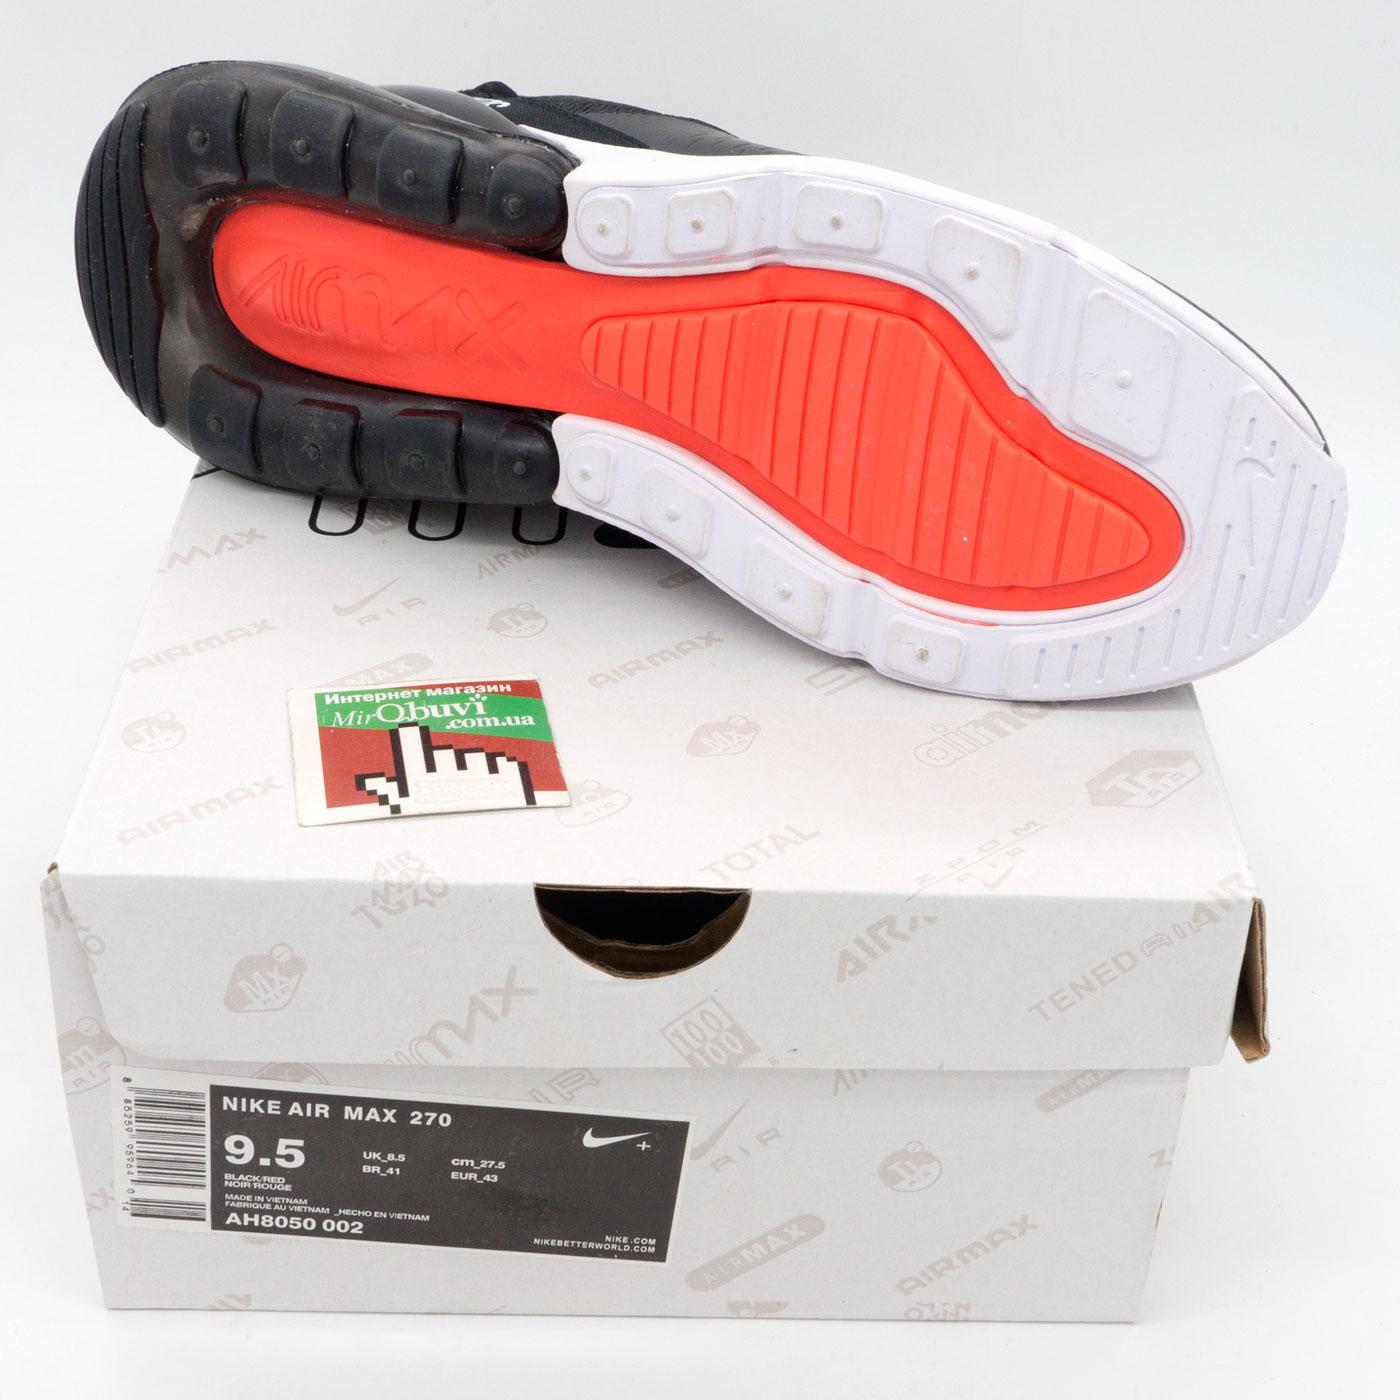 фото bottom Кроссовки Nike Air Max 270 Flyknit черно белые. Топ качество! bottom